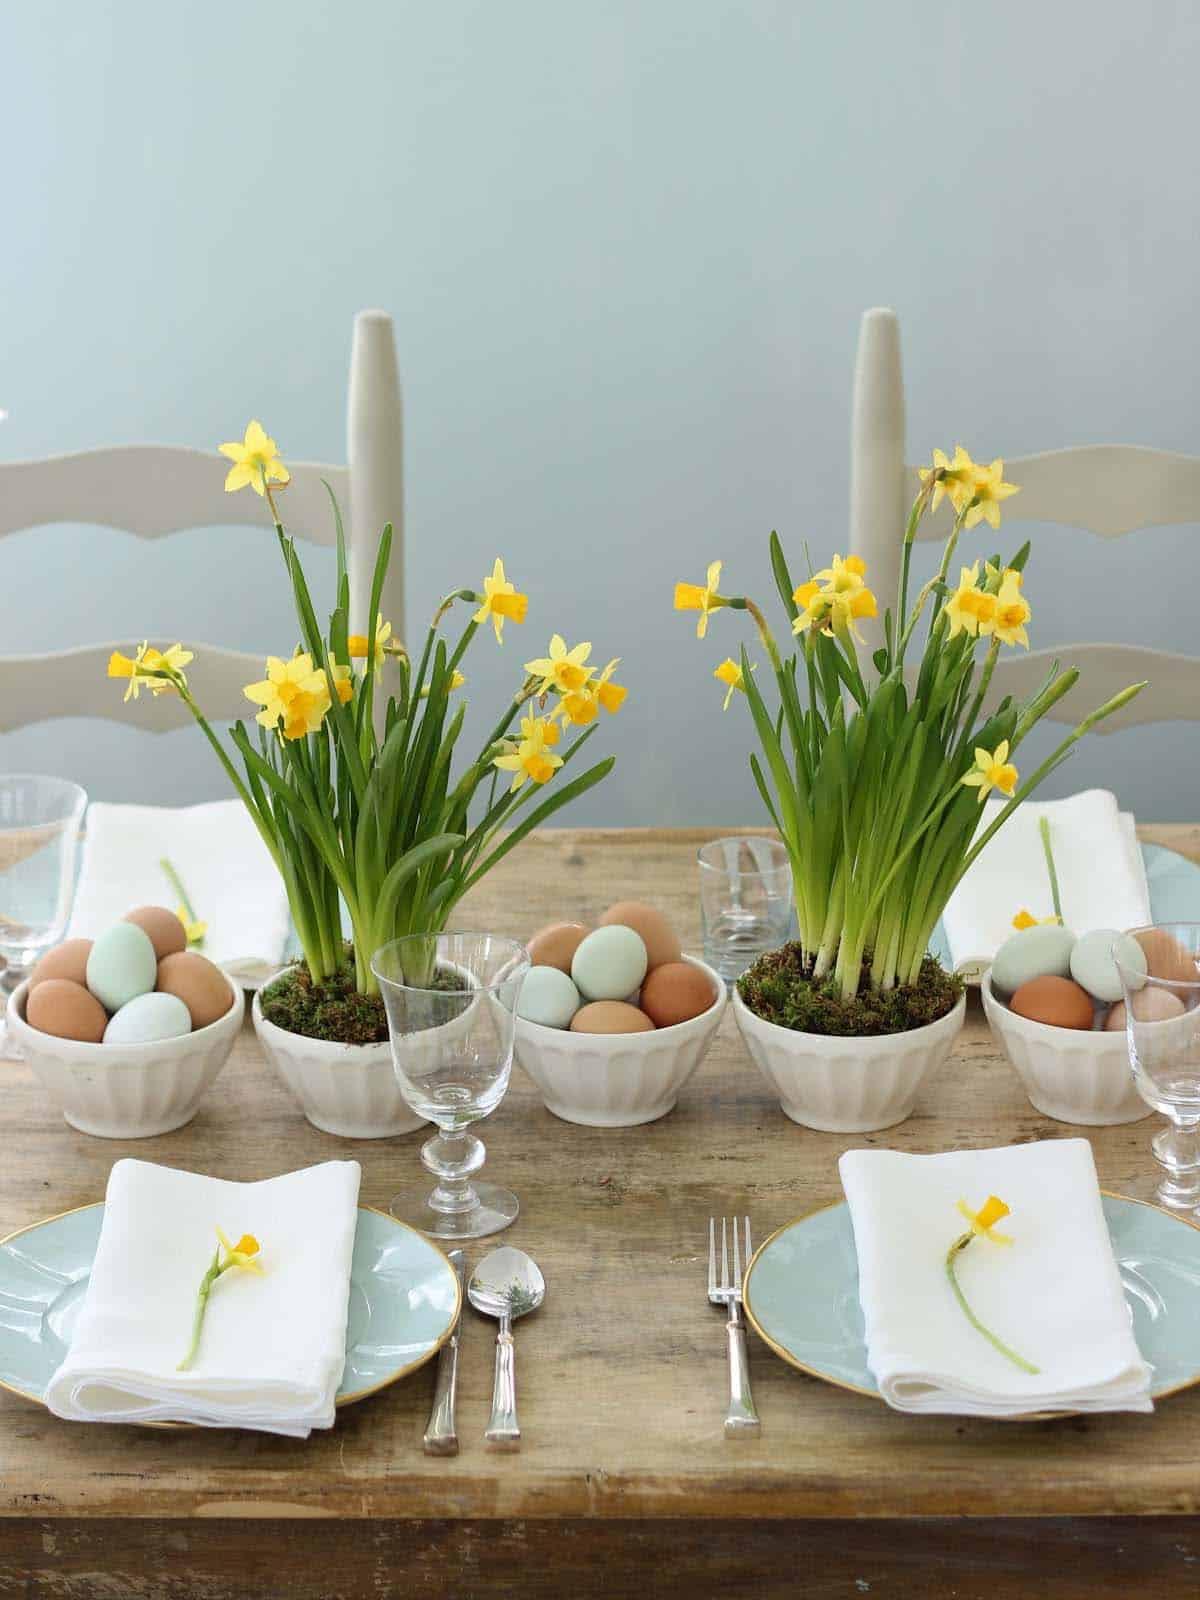 Inspiring Easter Table Centerpiece Ideas-11-1 Kindesign